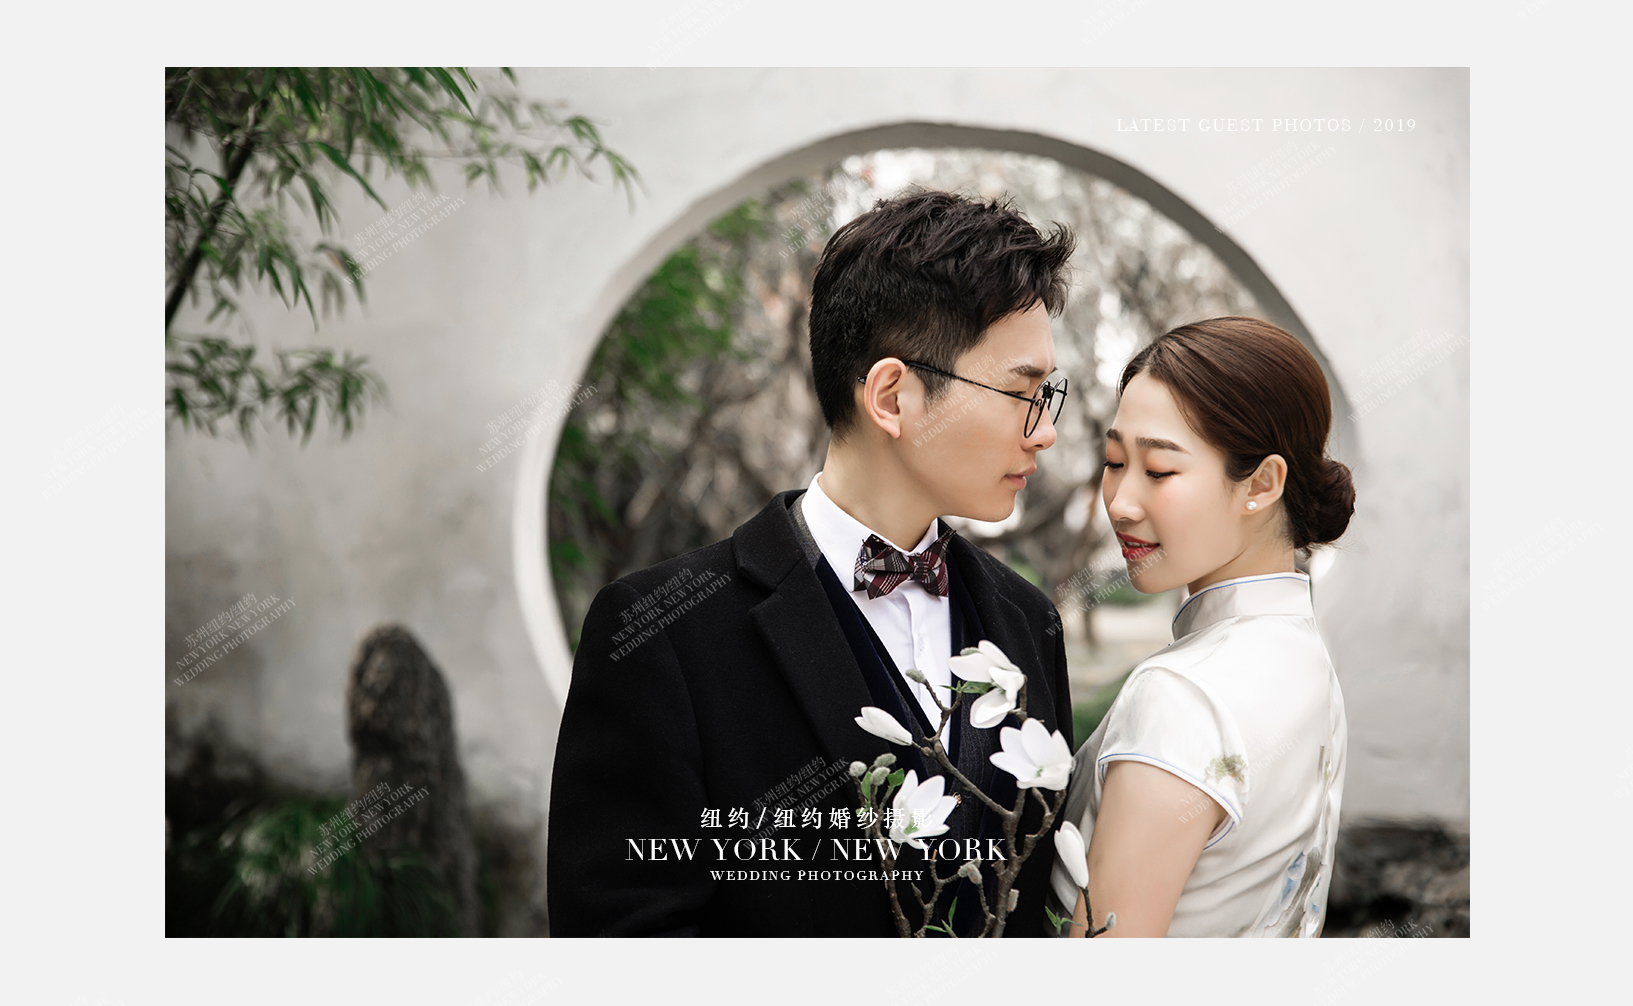 Mr.葛 & Ms.丛(纽约纽约最新客照)婚纱摄影照